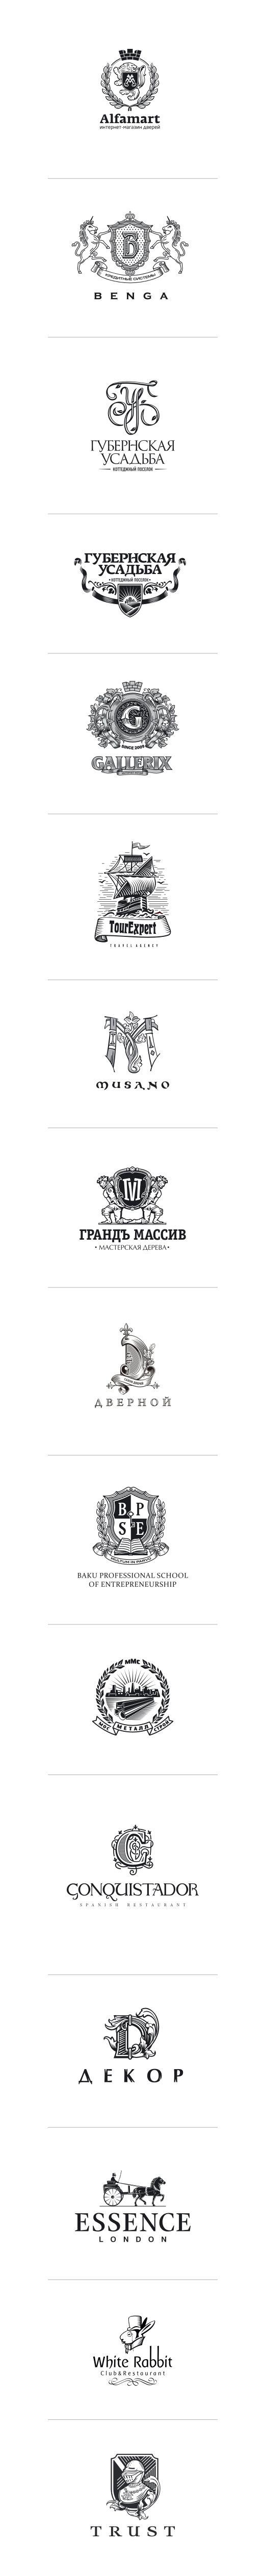 Logos in heraldic style on Behance